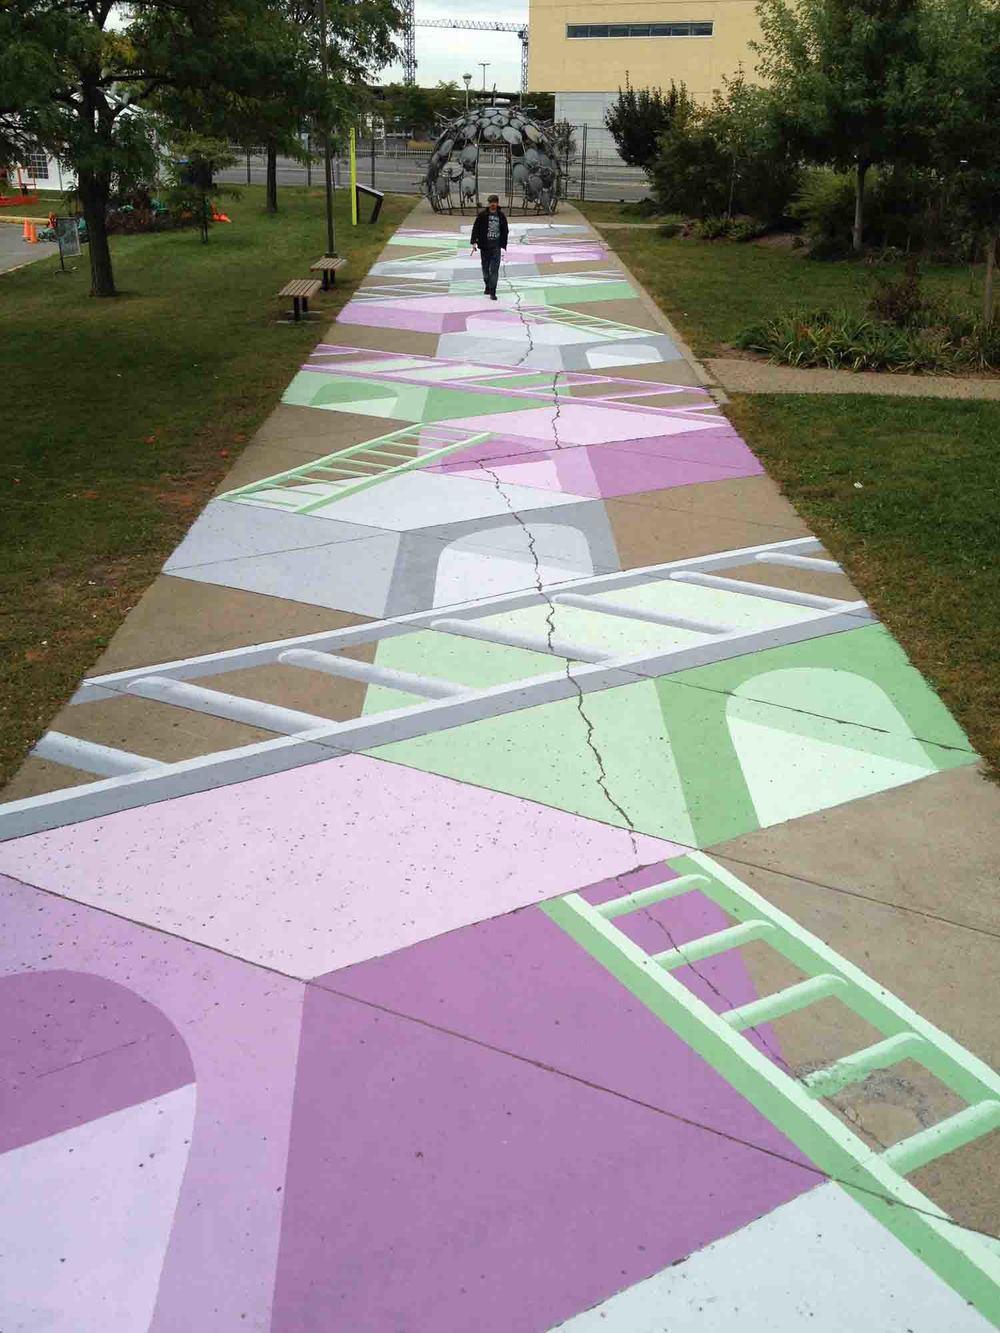 street-art-piste-ciclabili-montreal-roadsworth-11